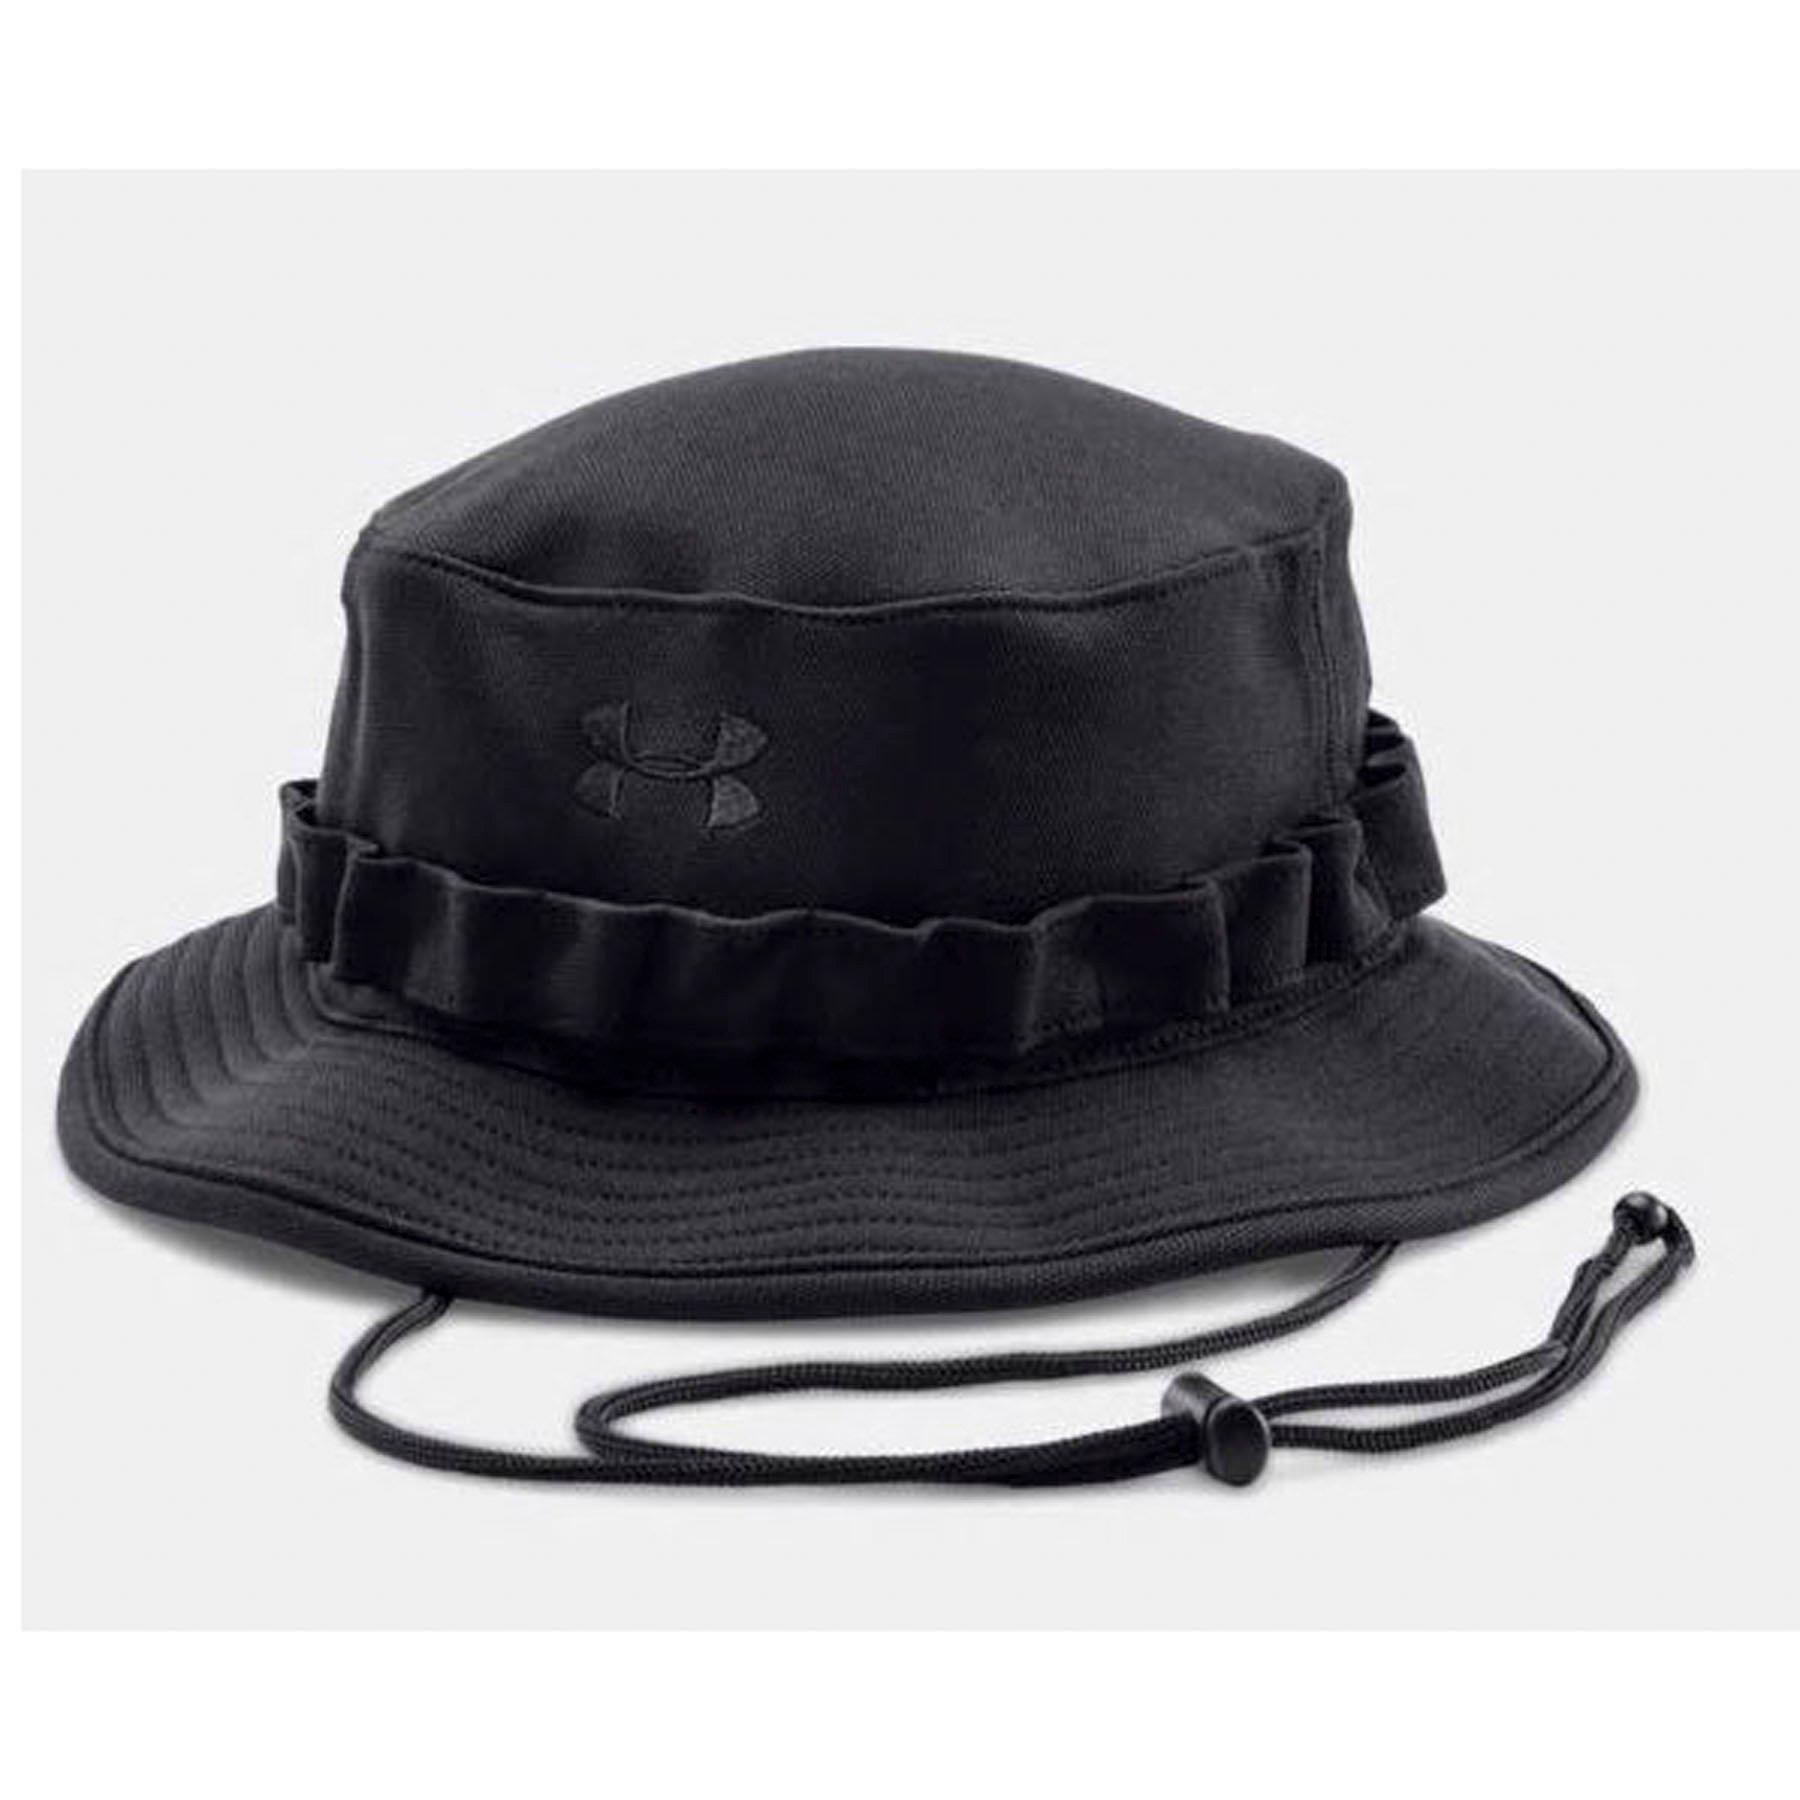 30cc3b6c086 Under Armour Tactical Bucket Hat